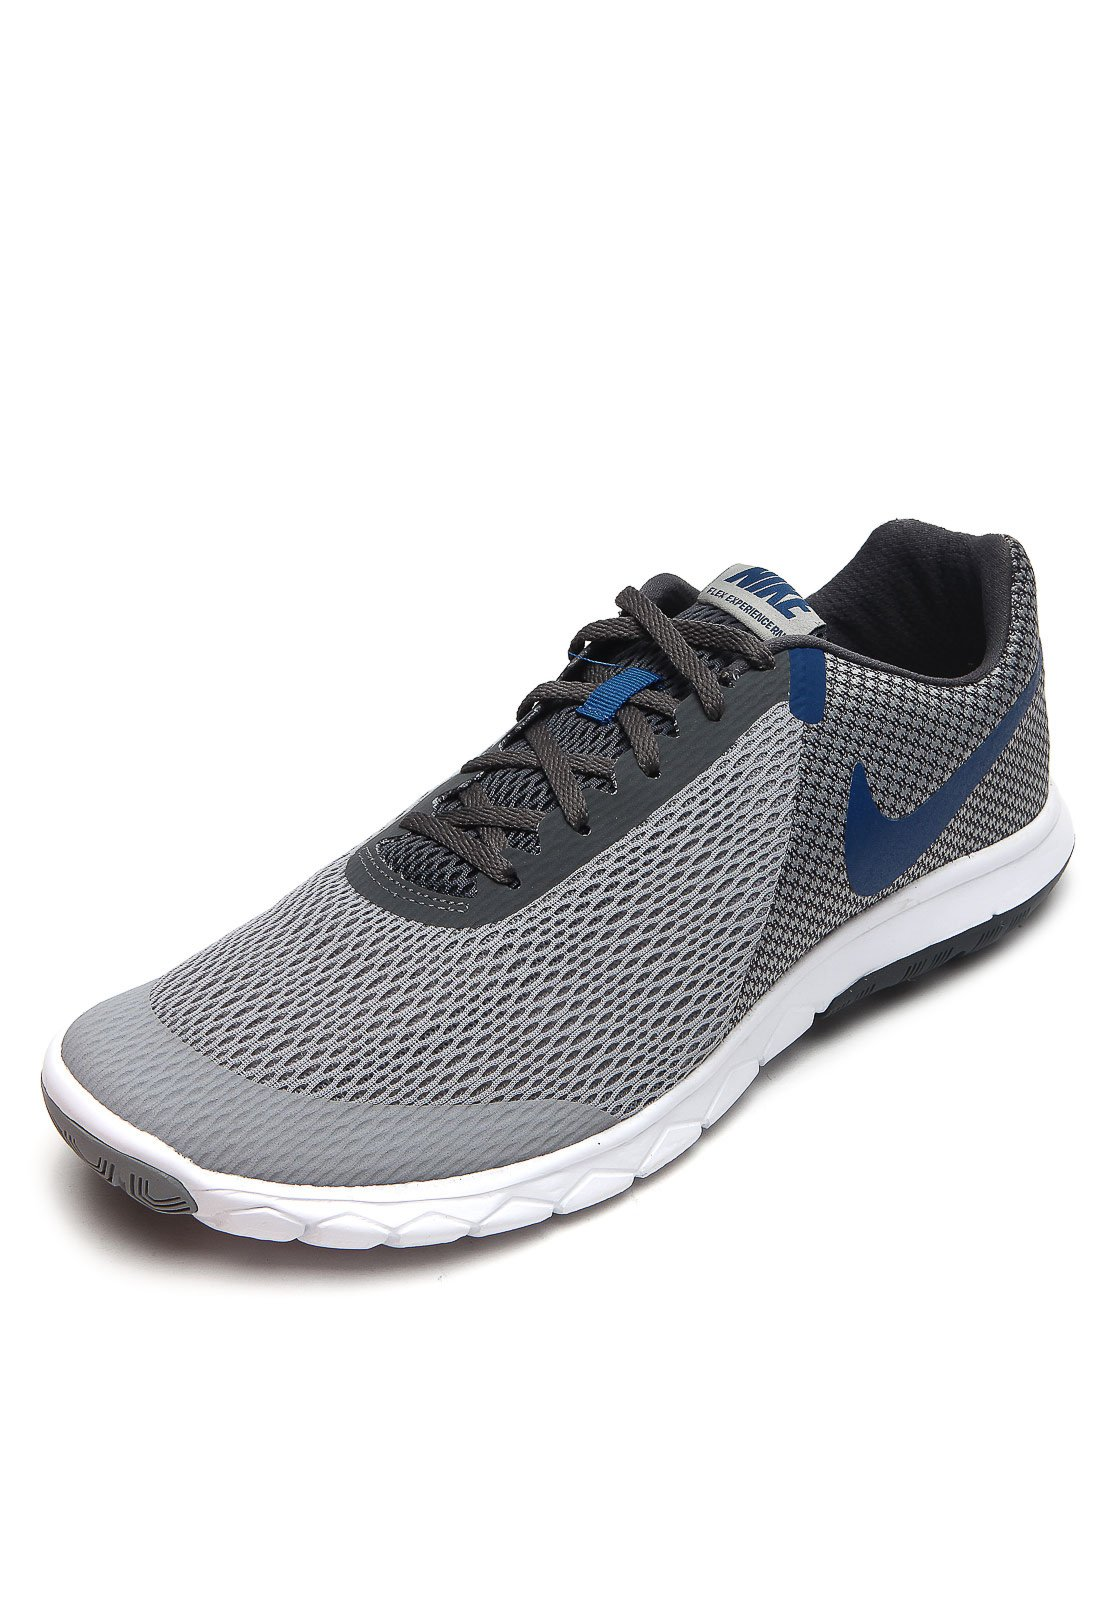 Convencional Disipar De hecho  Tênis Nike Flex Experience RN 6 Cinza - Compre Agora   Kanui Brasil